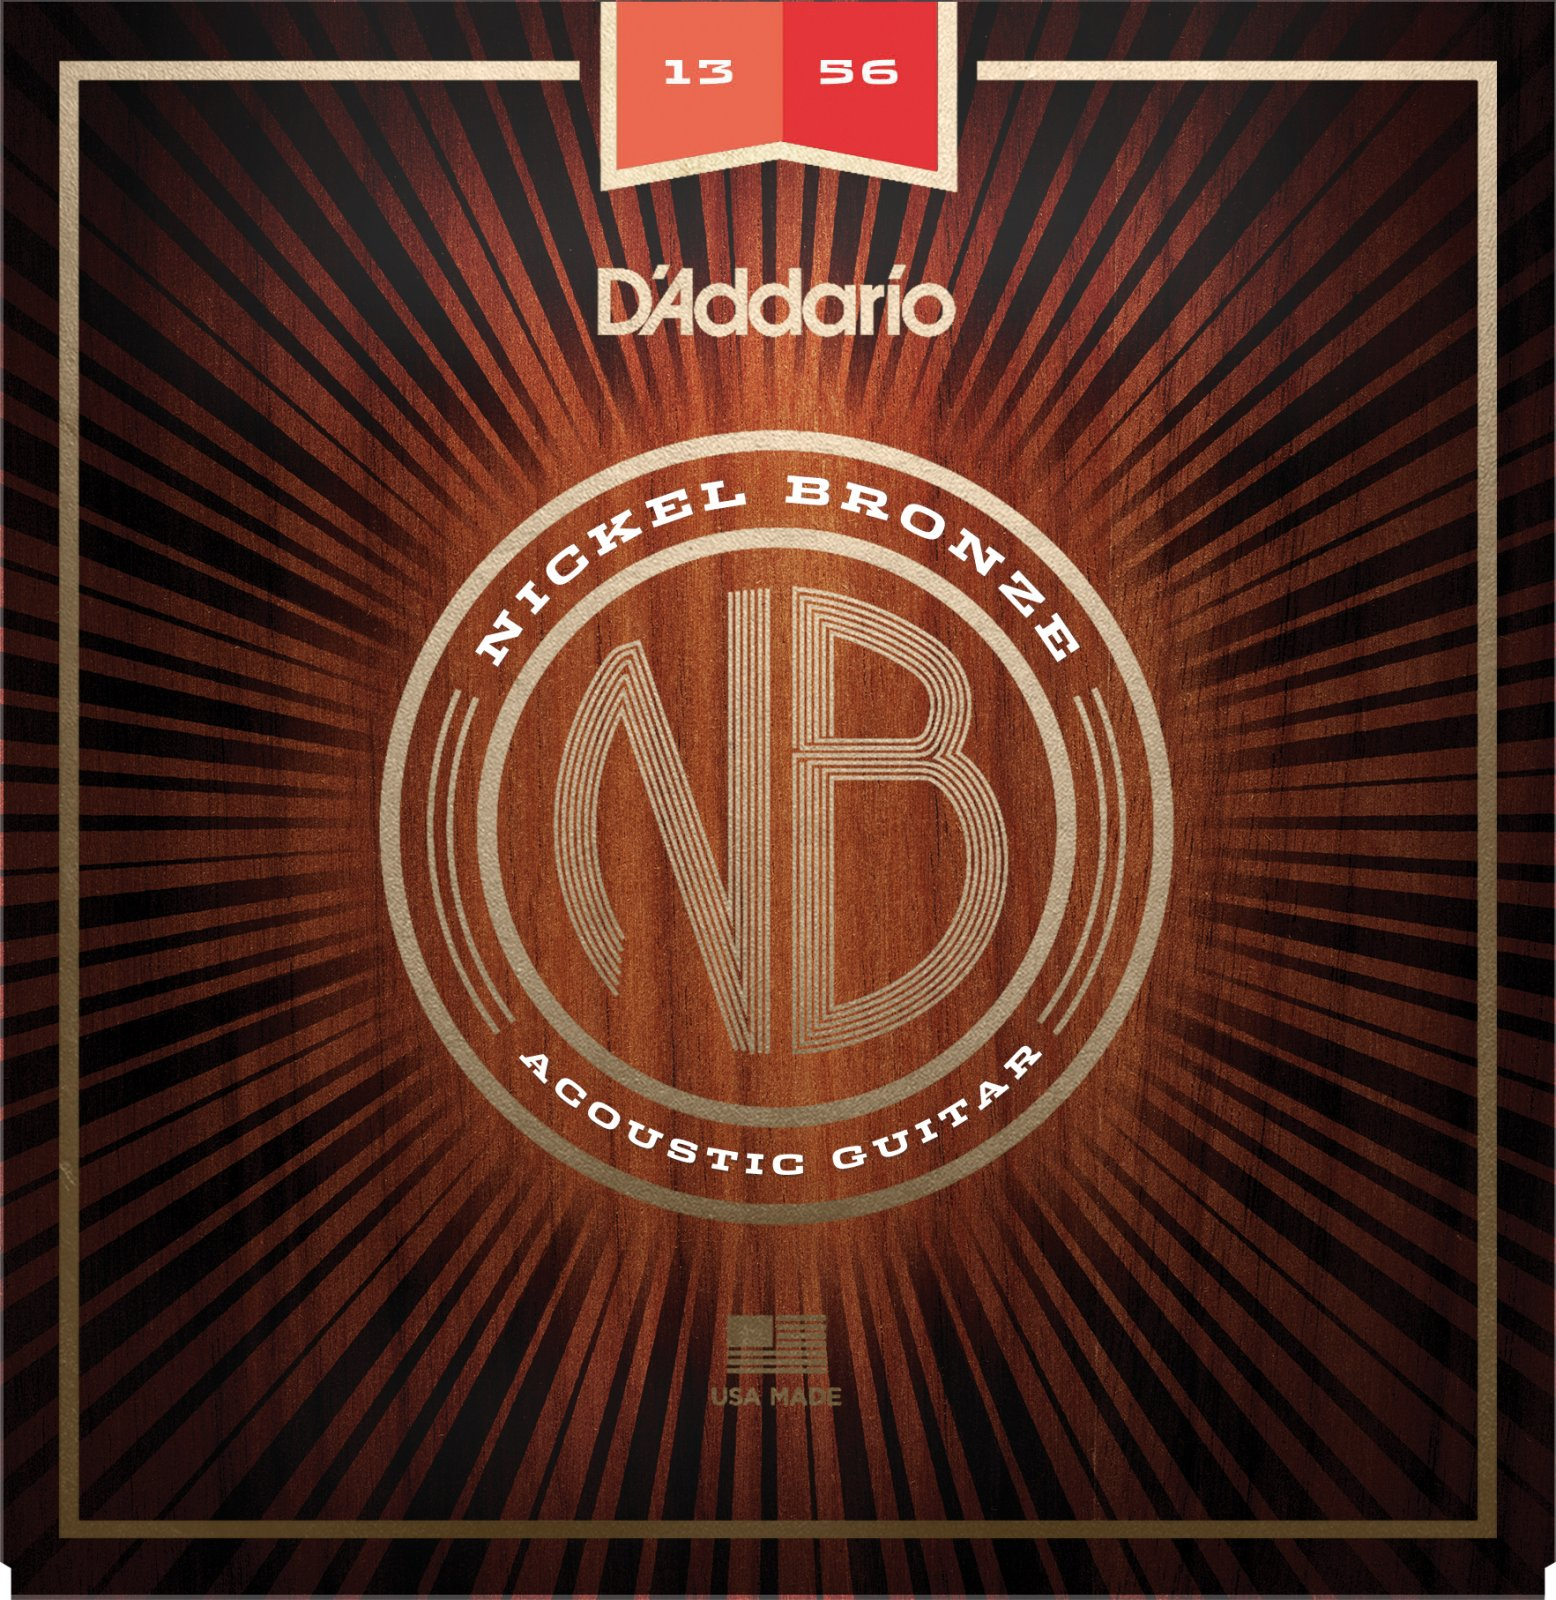 Daddario NB1356 Nickle Bronze Acoustic Medium 13-56